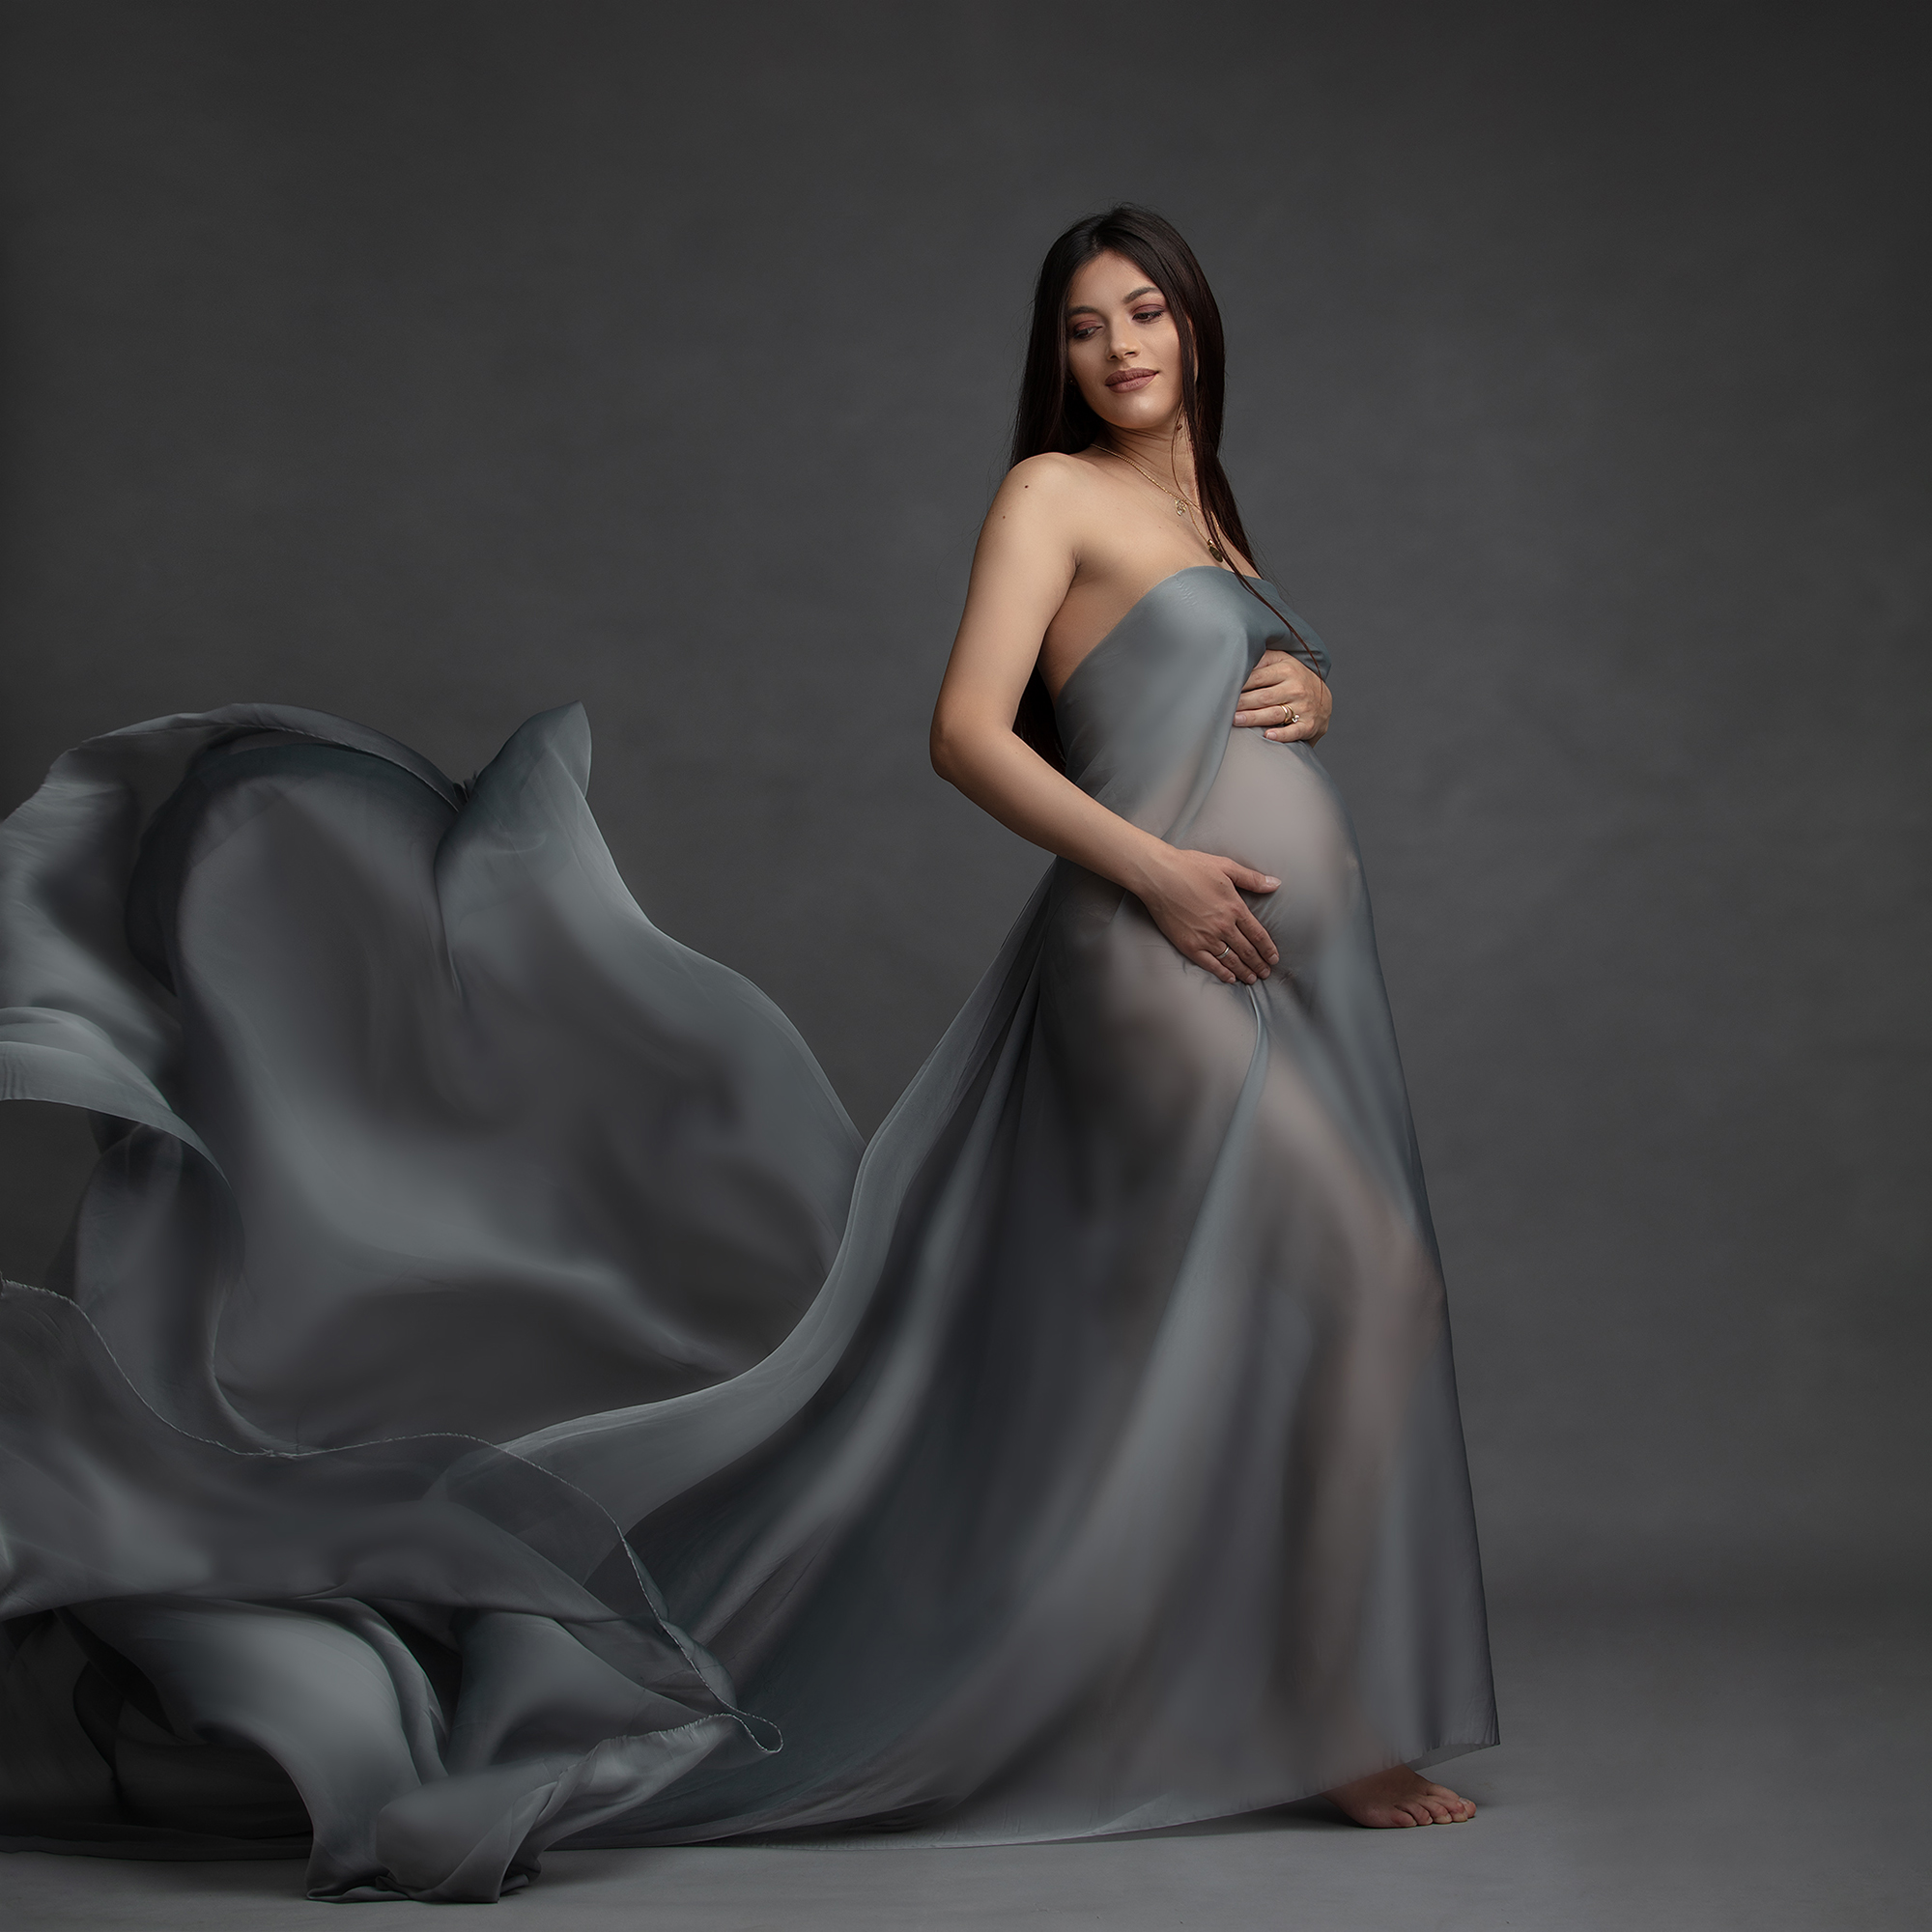 Justina_Cereskaite_Maternity_November_En